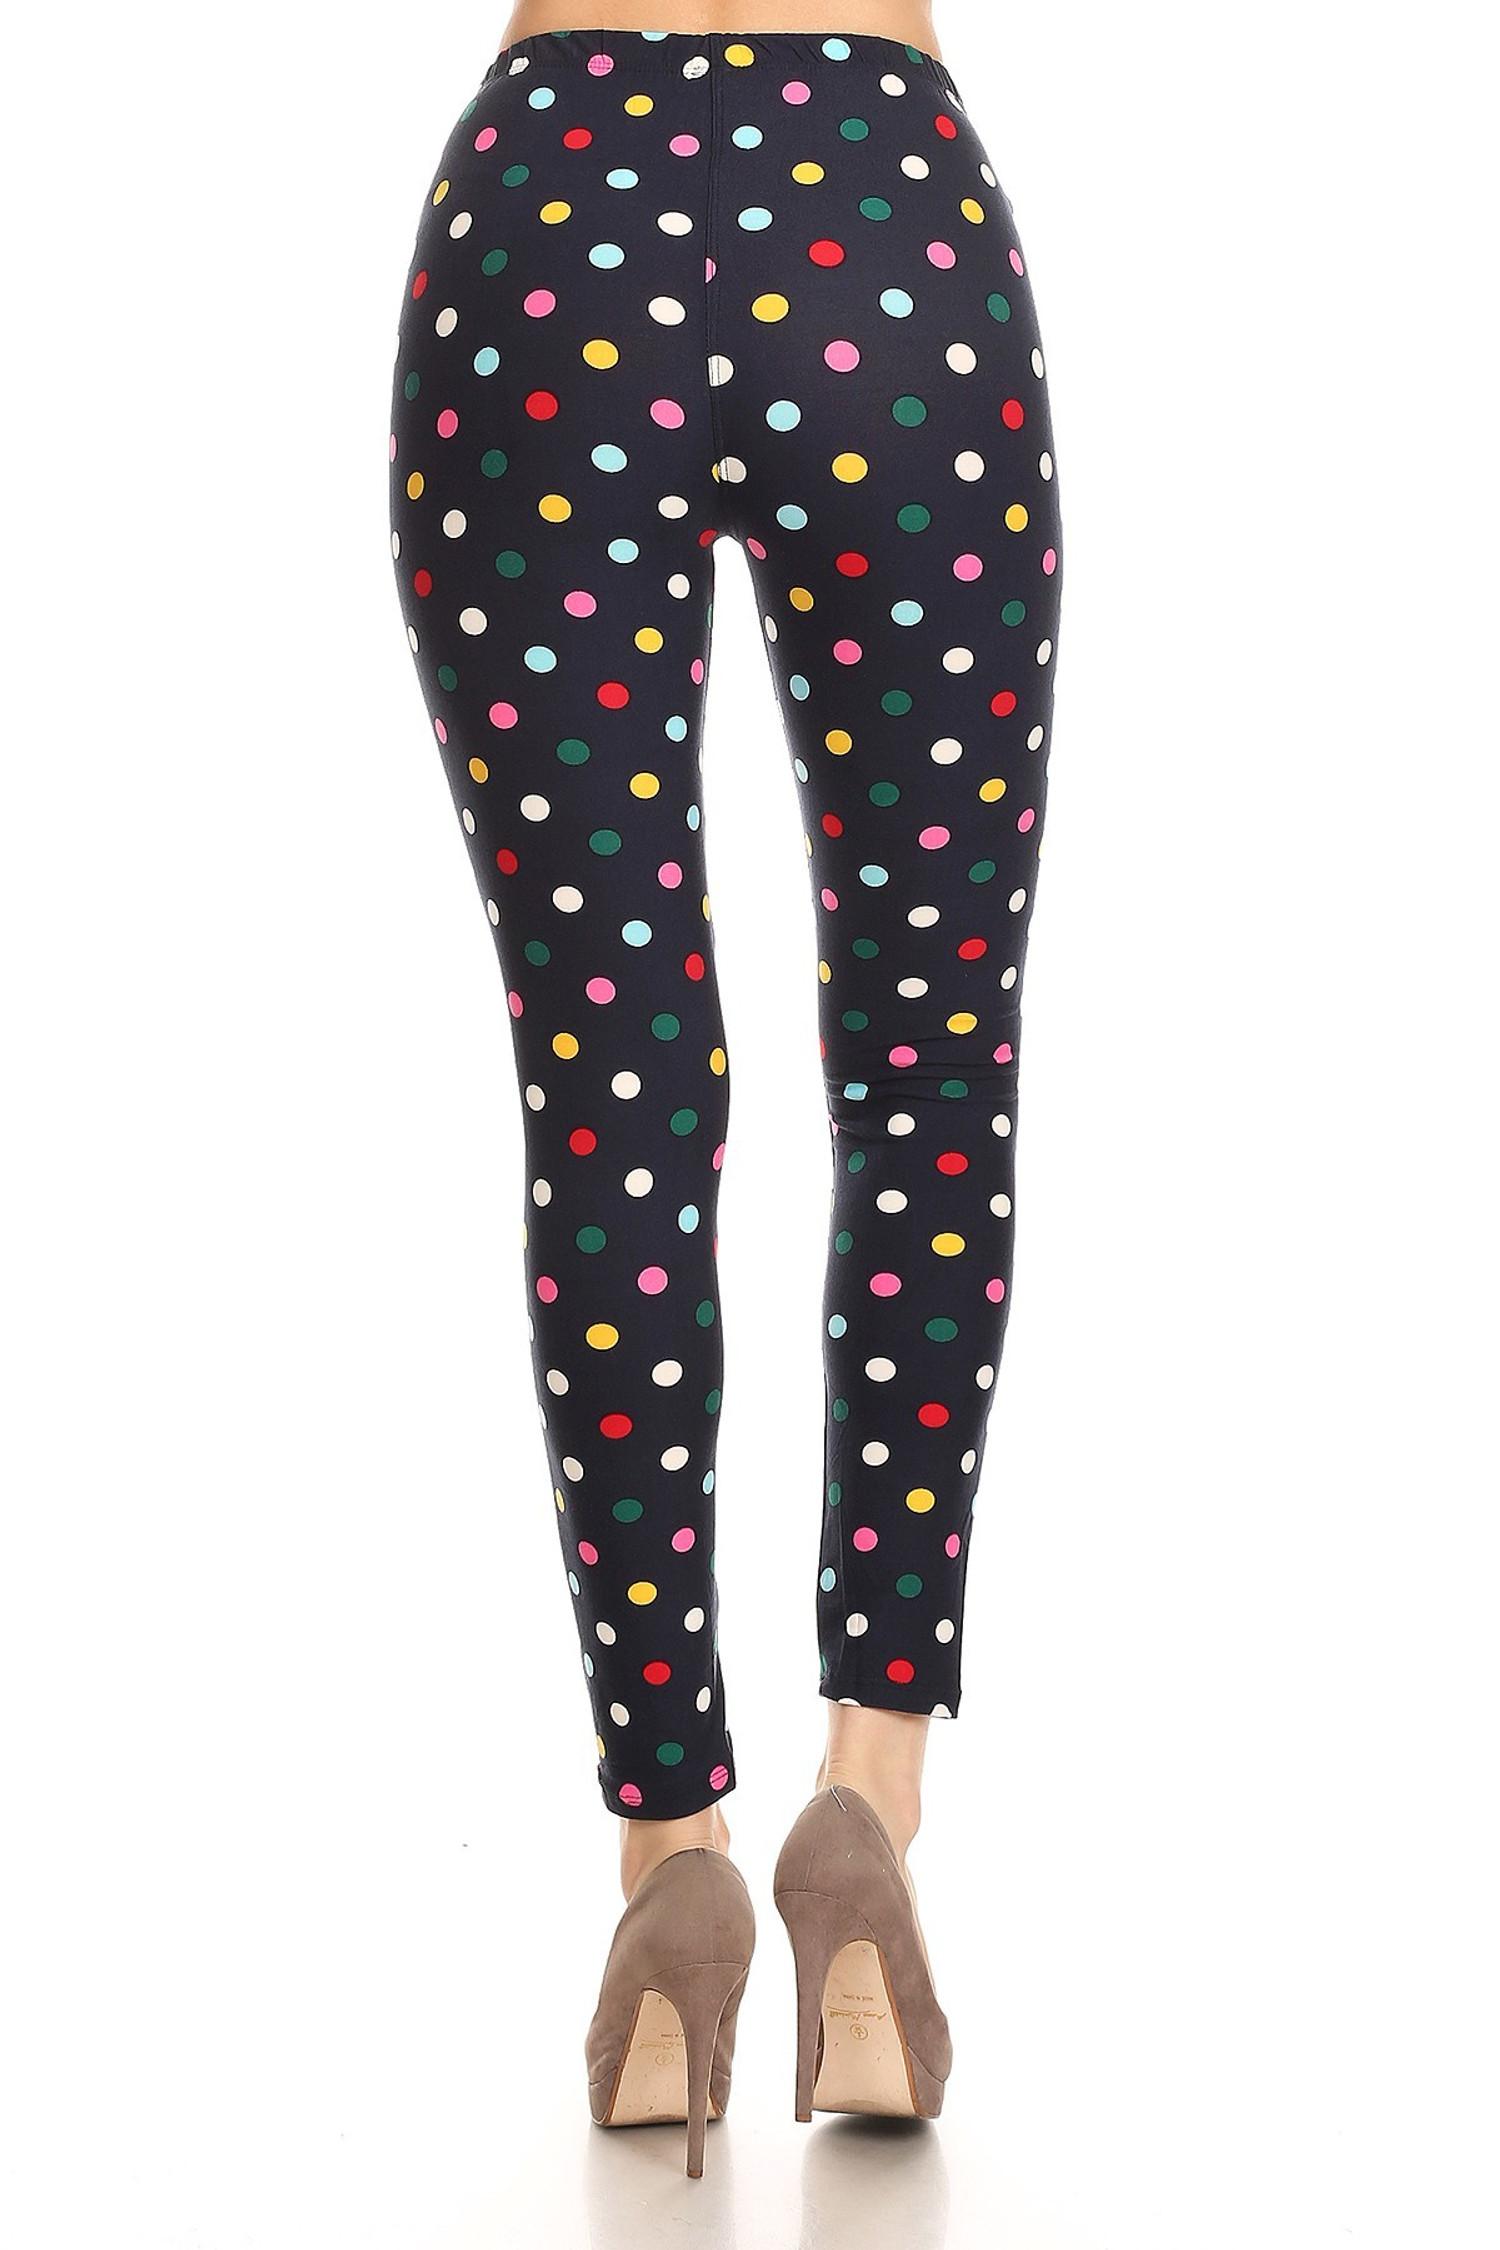 Soft Brushed Colorful Polka Dot Plus Size Leggings - 3X-5X